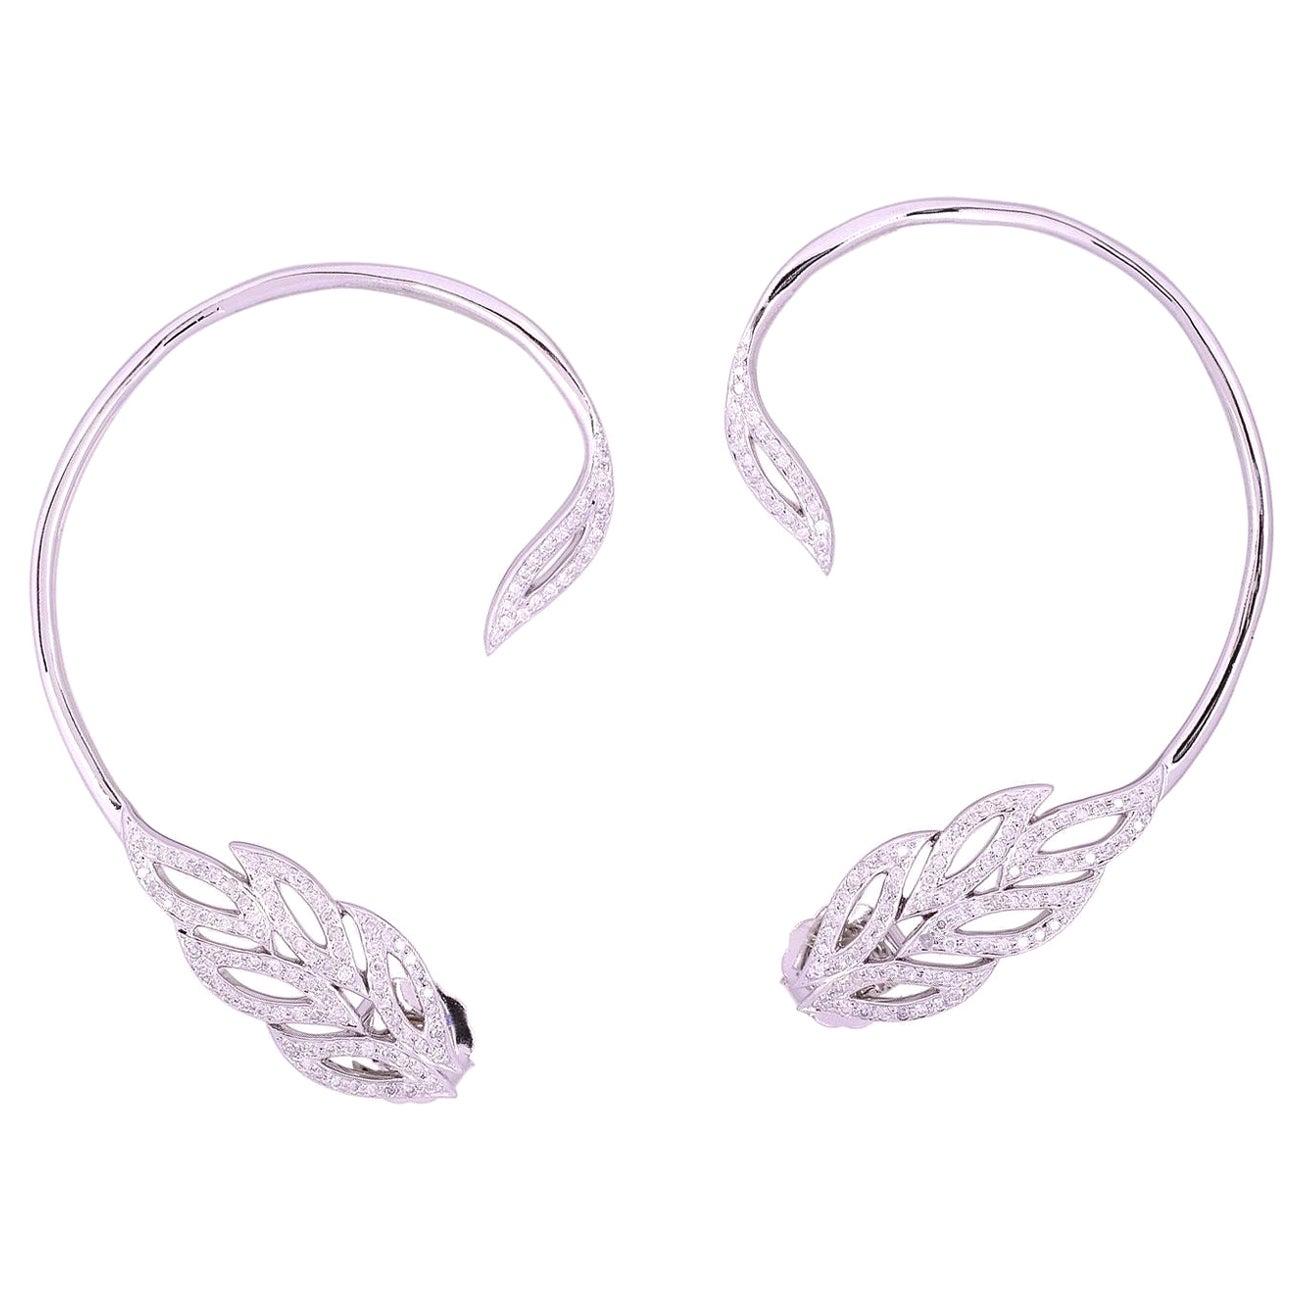 Feather 18 Karat Gold Diamond Ear Climber Earrings